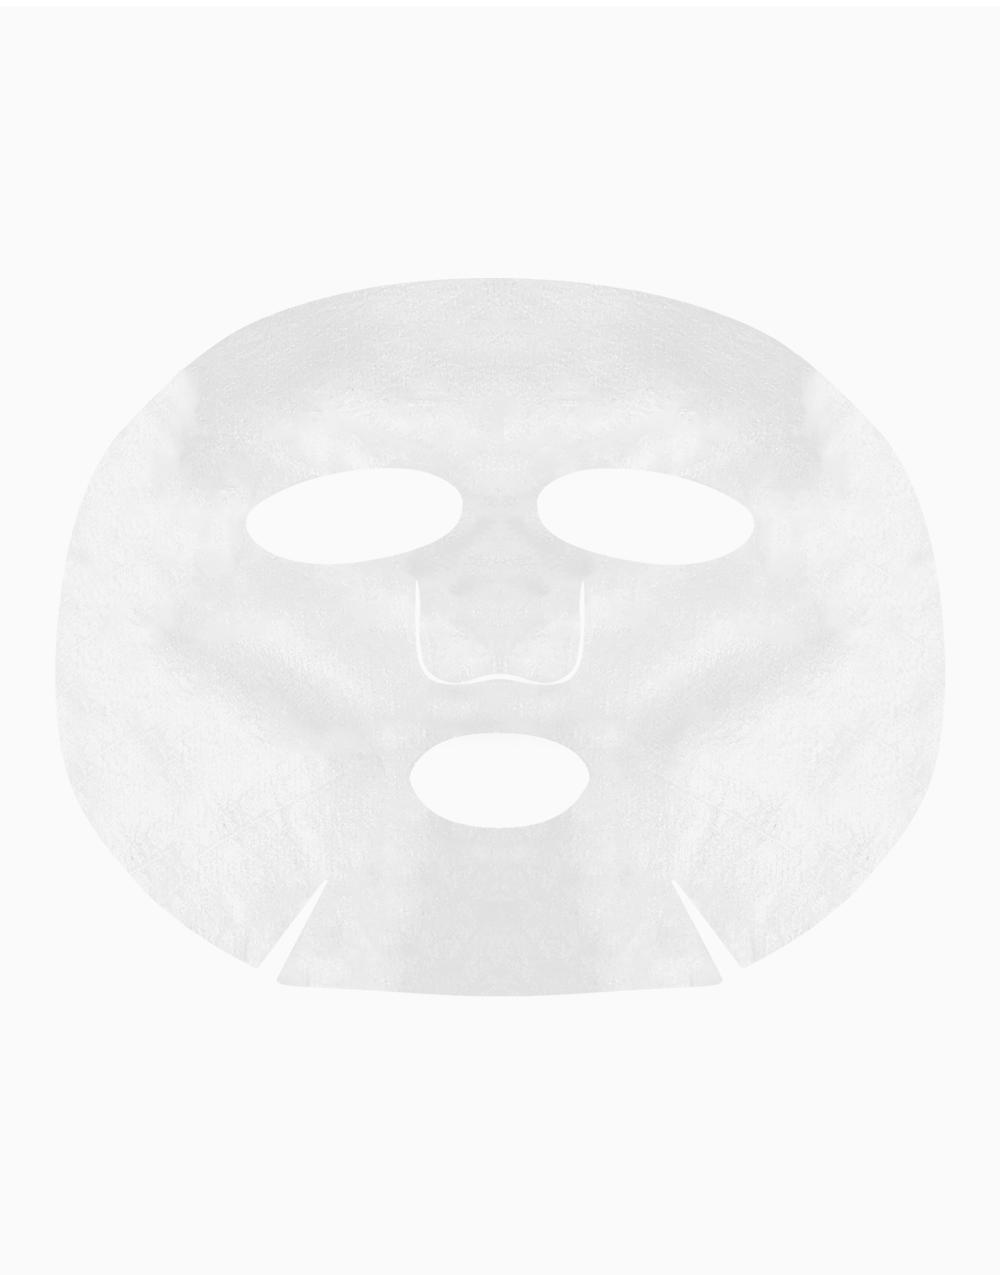 Pure Skin Herb Essence Mask Sheet by Esfolio